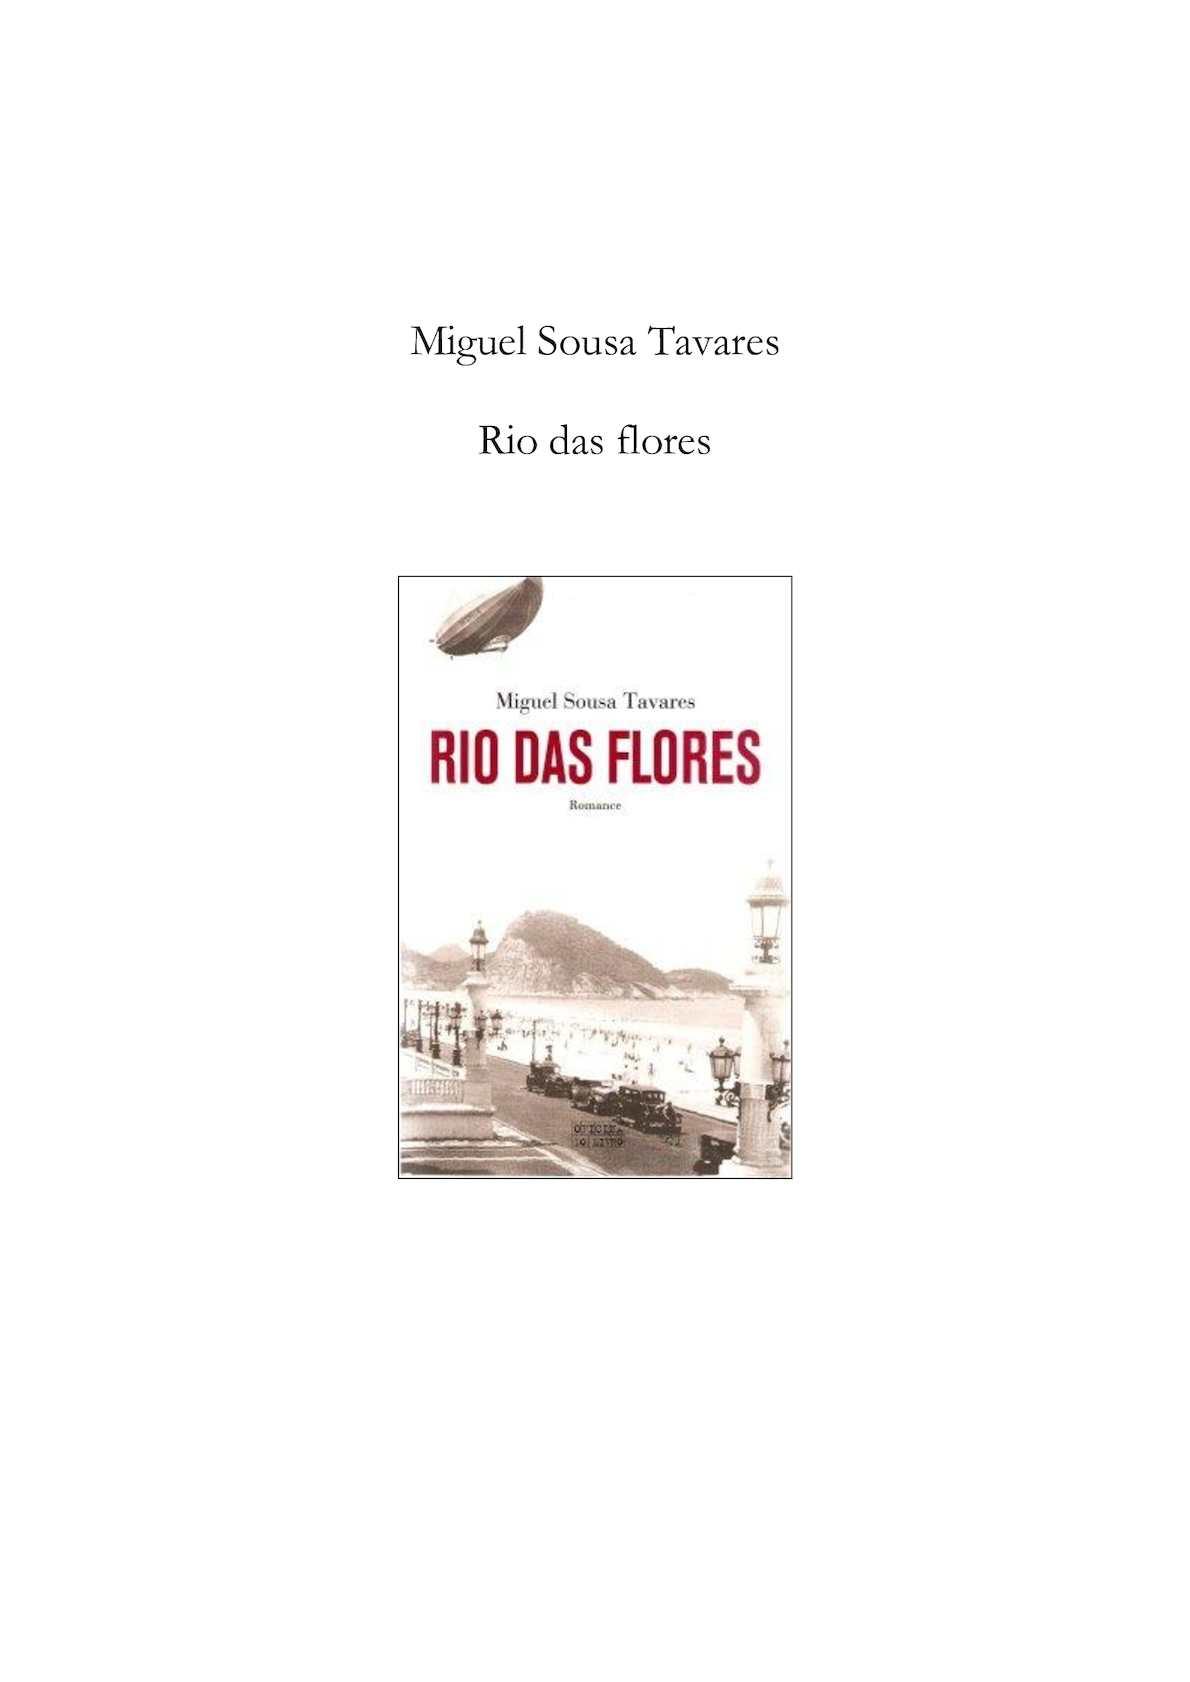 795c592c10 Calaméo - Miguel Sousa Tavares - Rio Das Flores